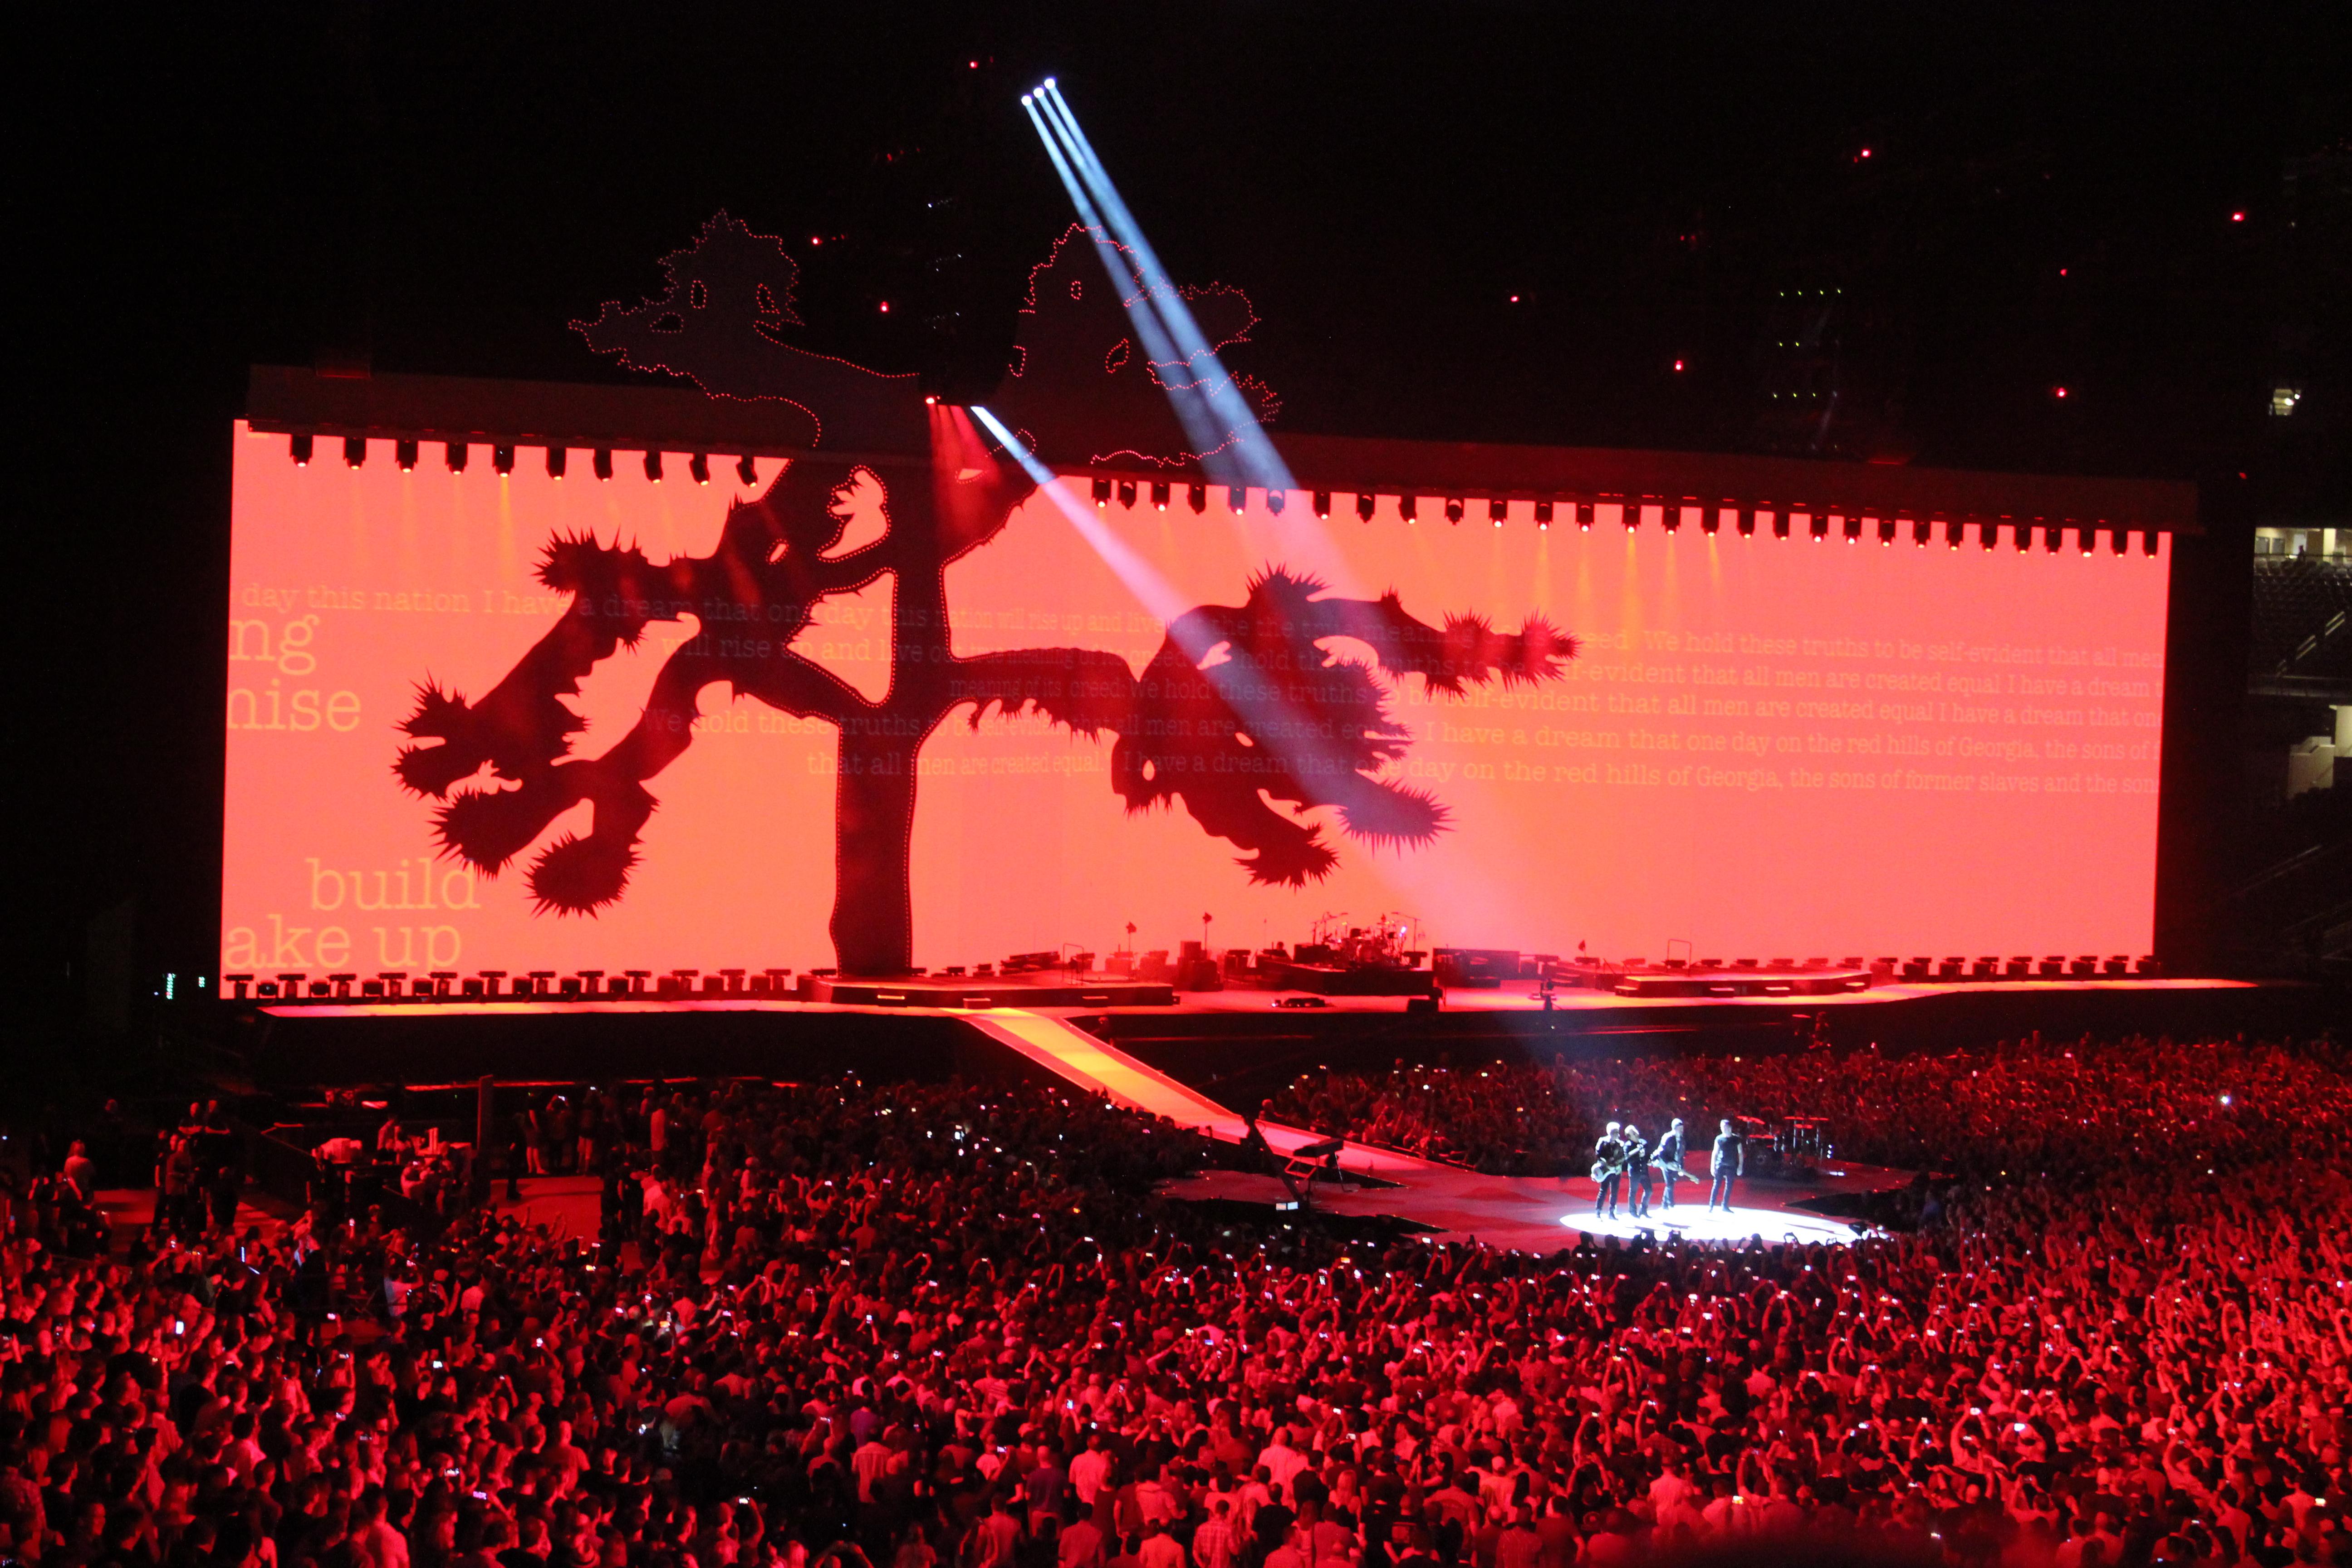 MORUMBI BAIXAR 2006 U2 SHOW